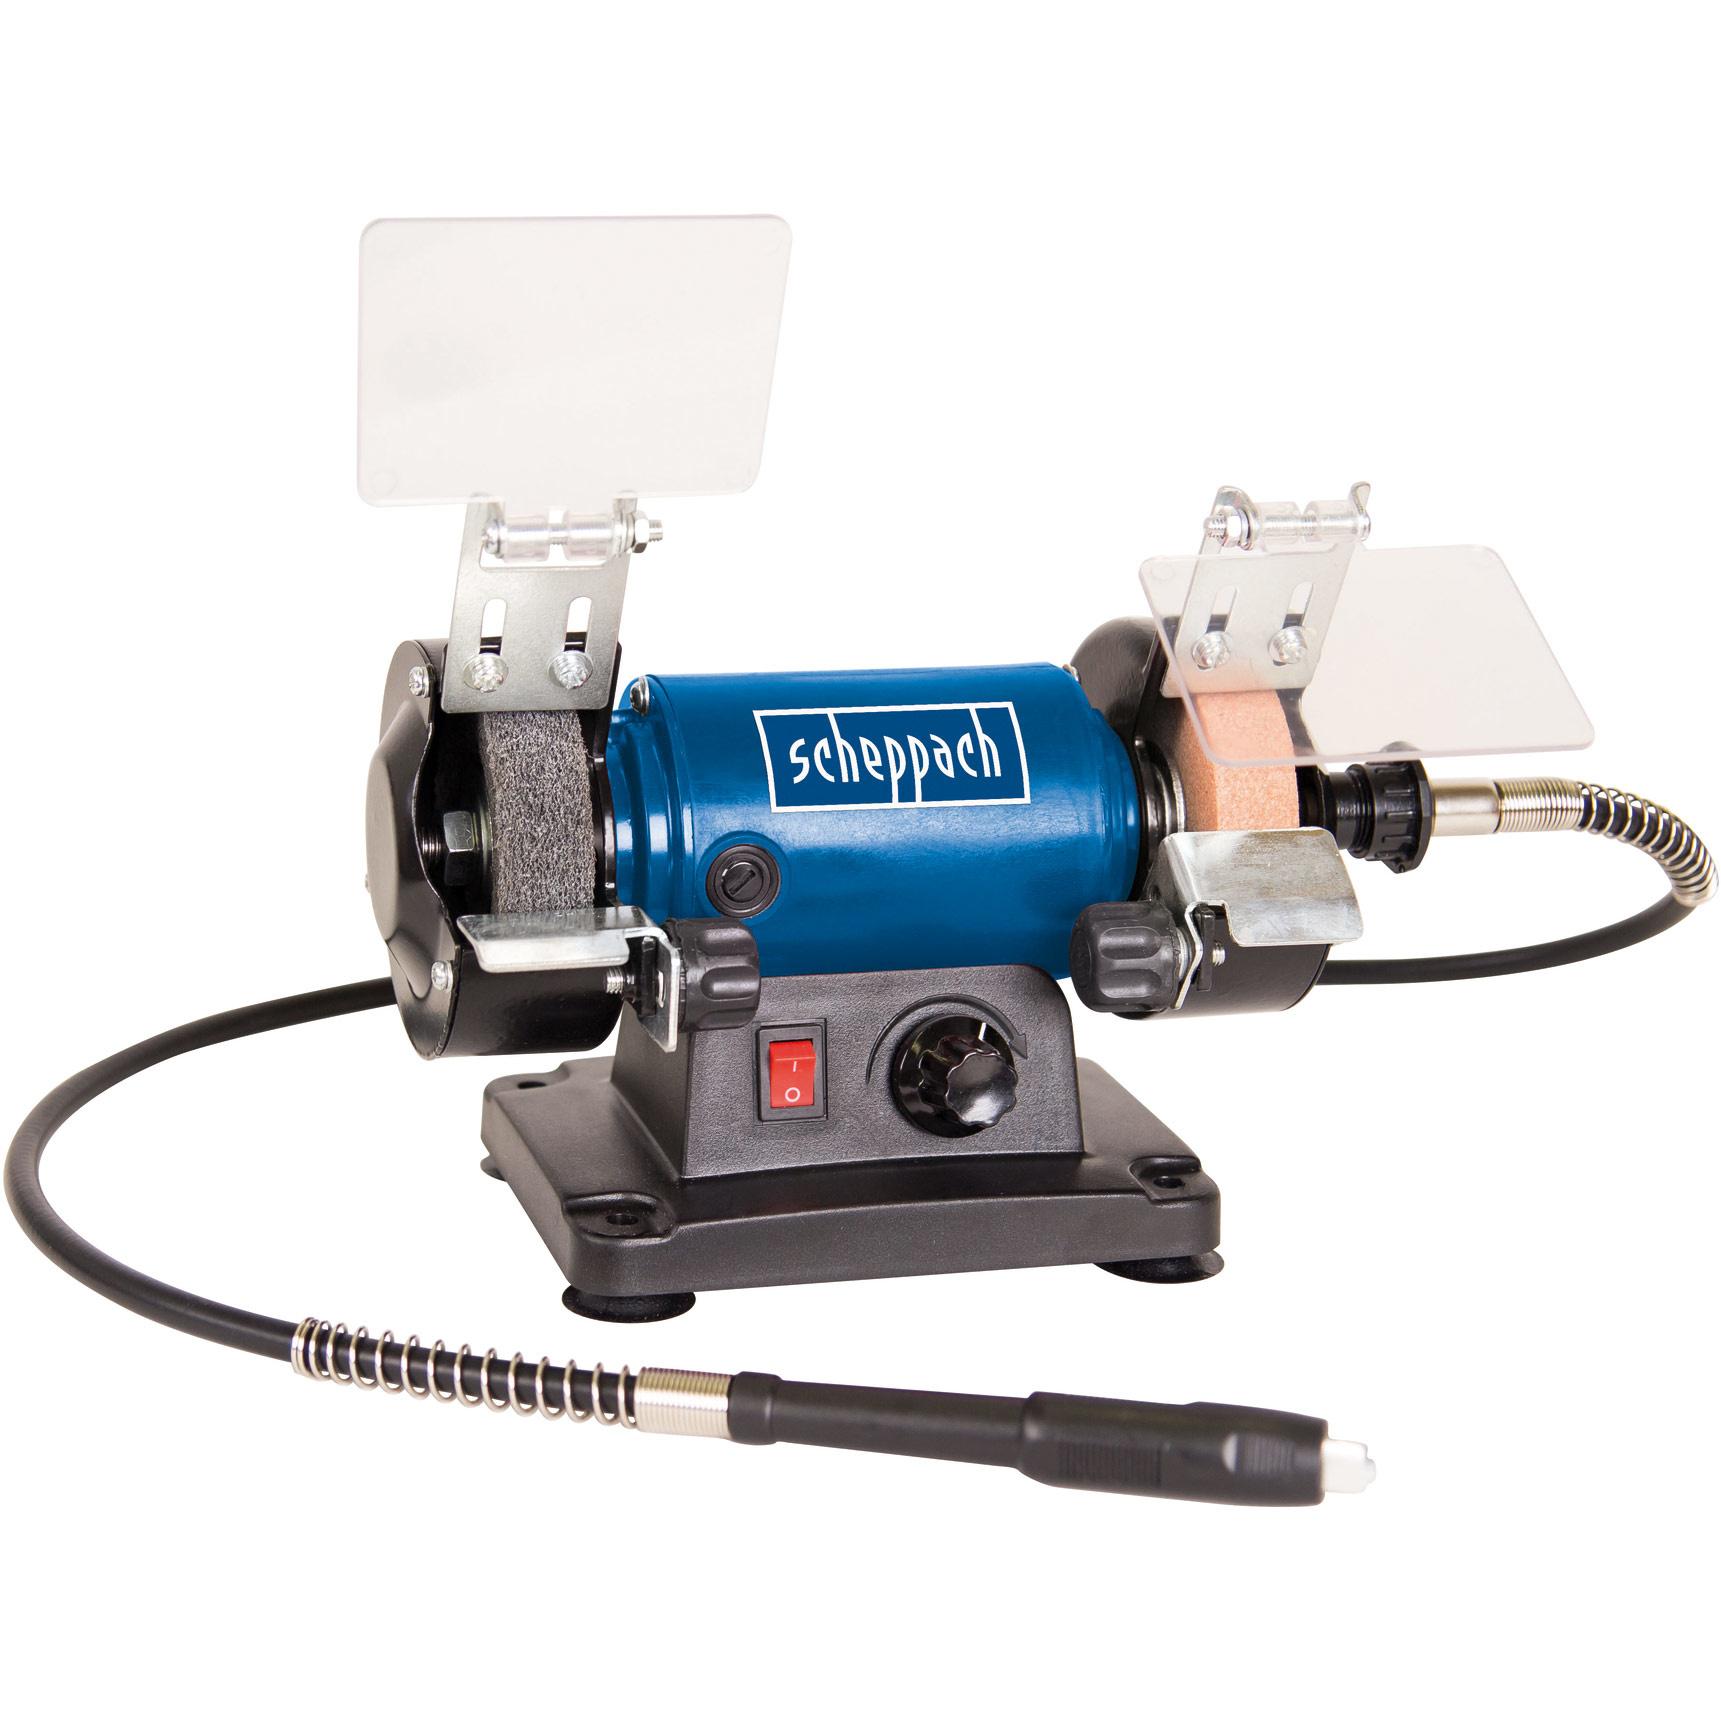 "Scheppach Slijp- en polijstmachine 3""HG34 inclusief 100-delige toolkit? Ø75mm   230V   1"